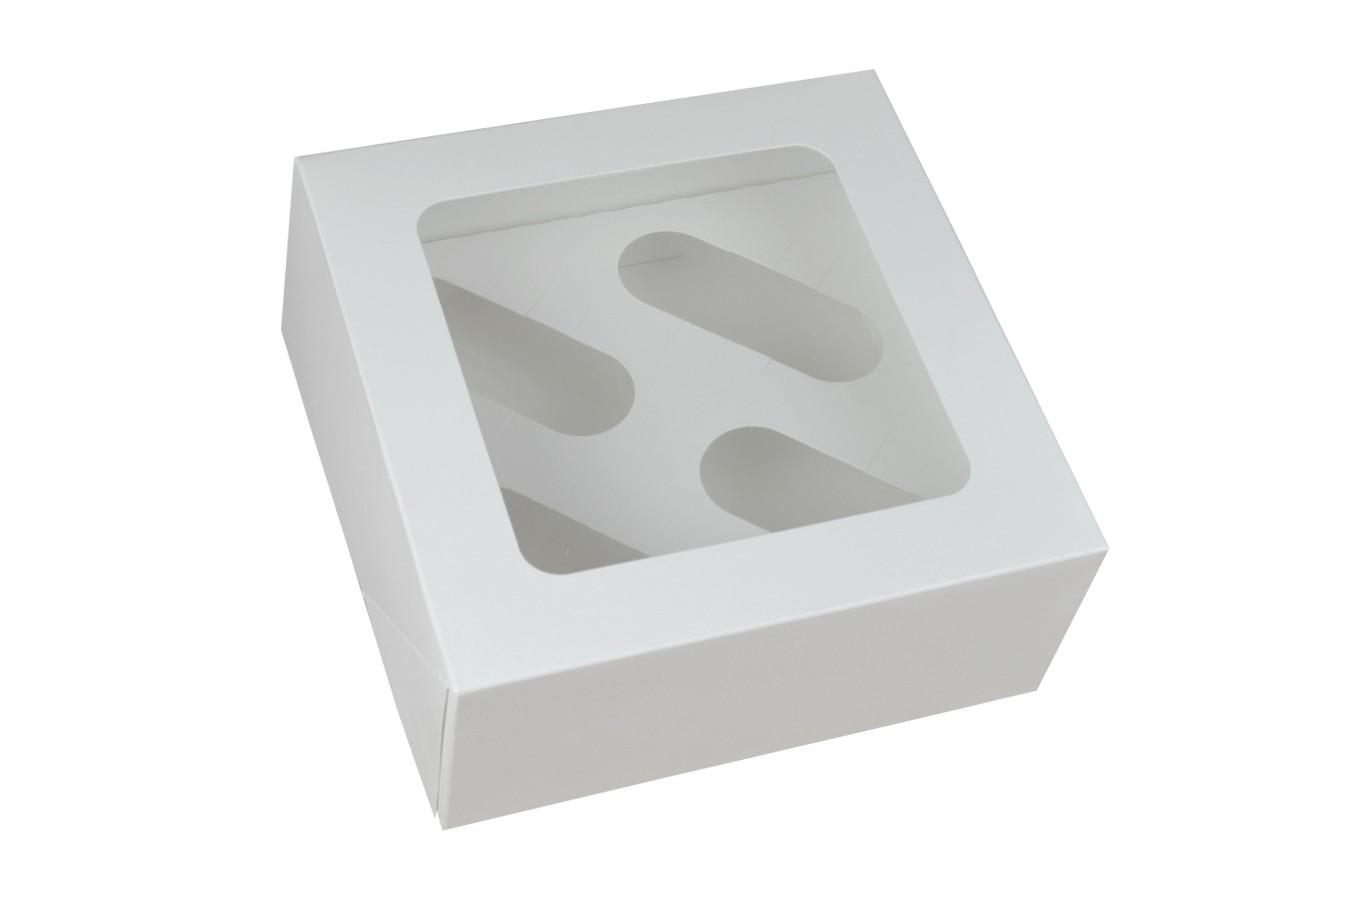 Boîte pour 4 cupcakes – Blanc